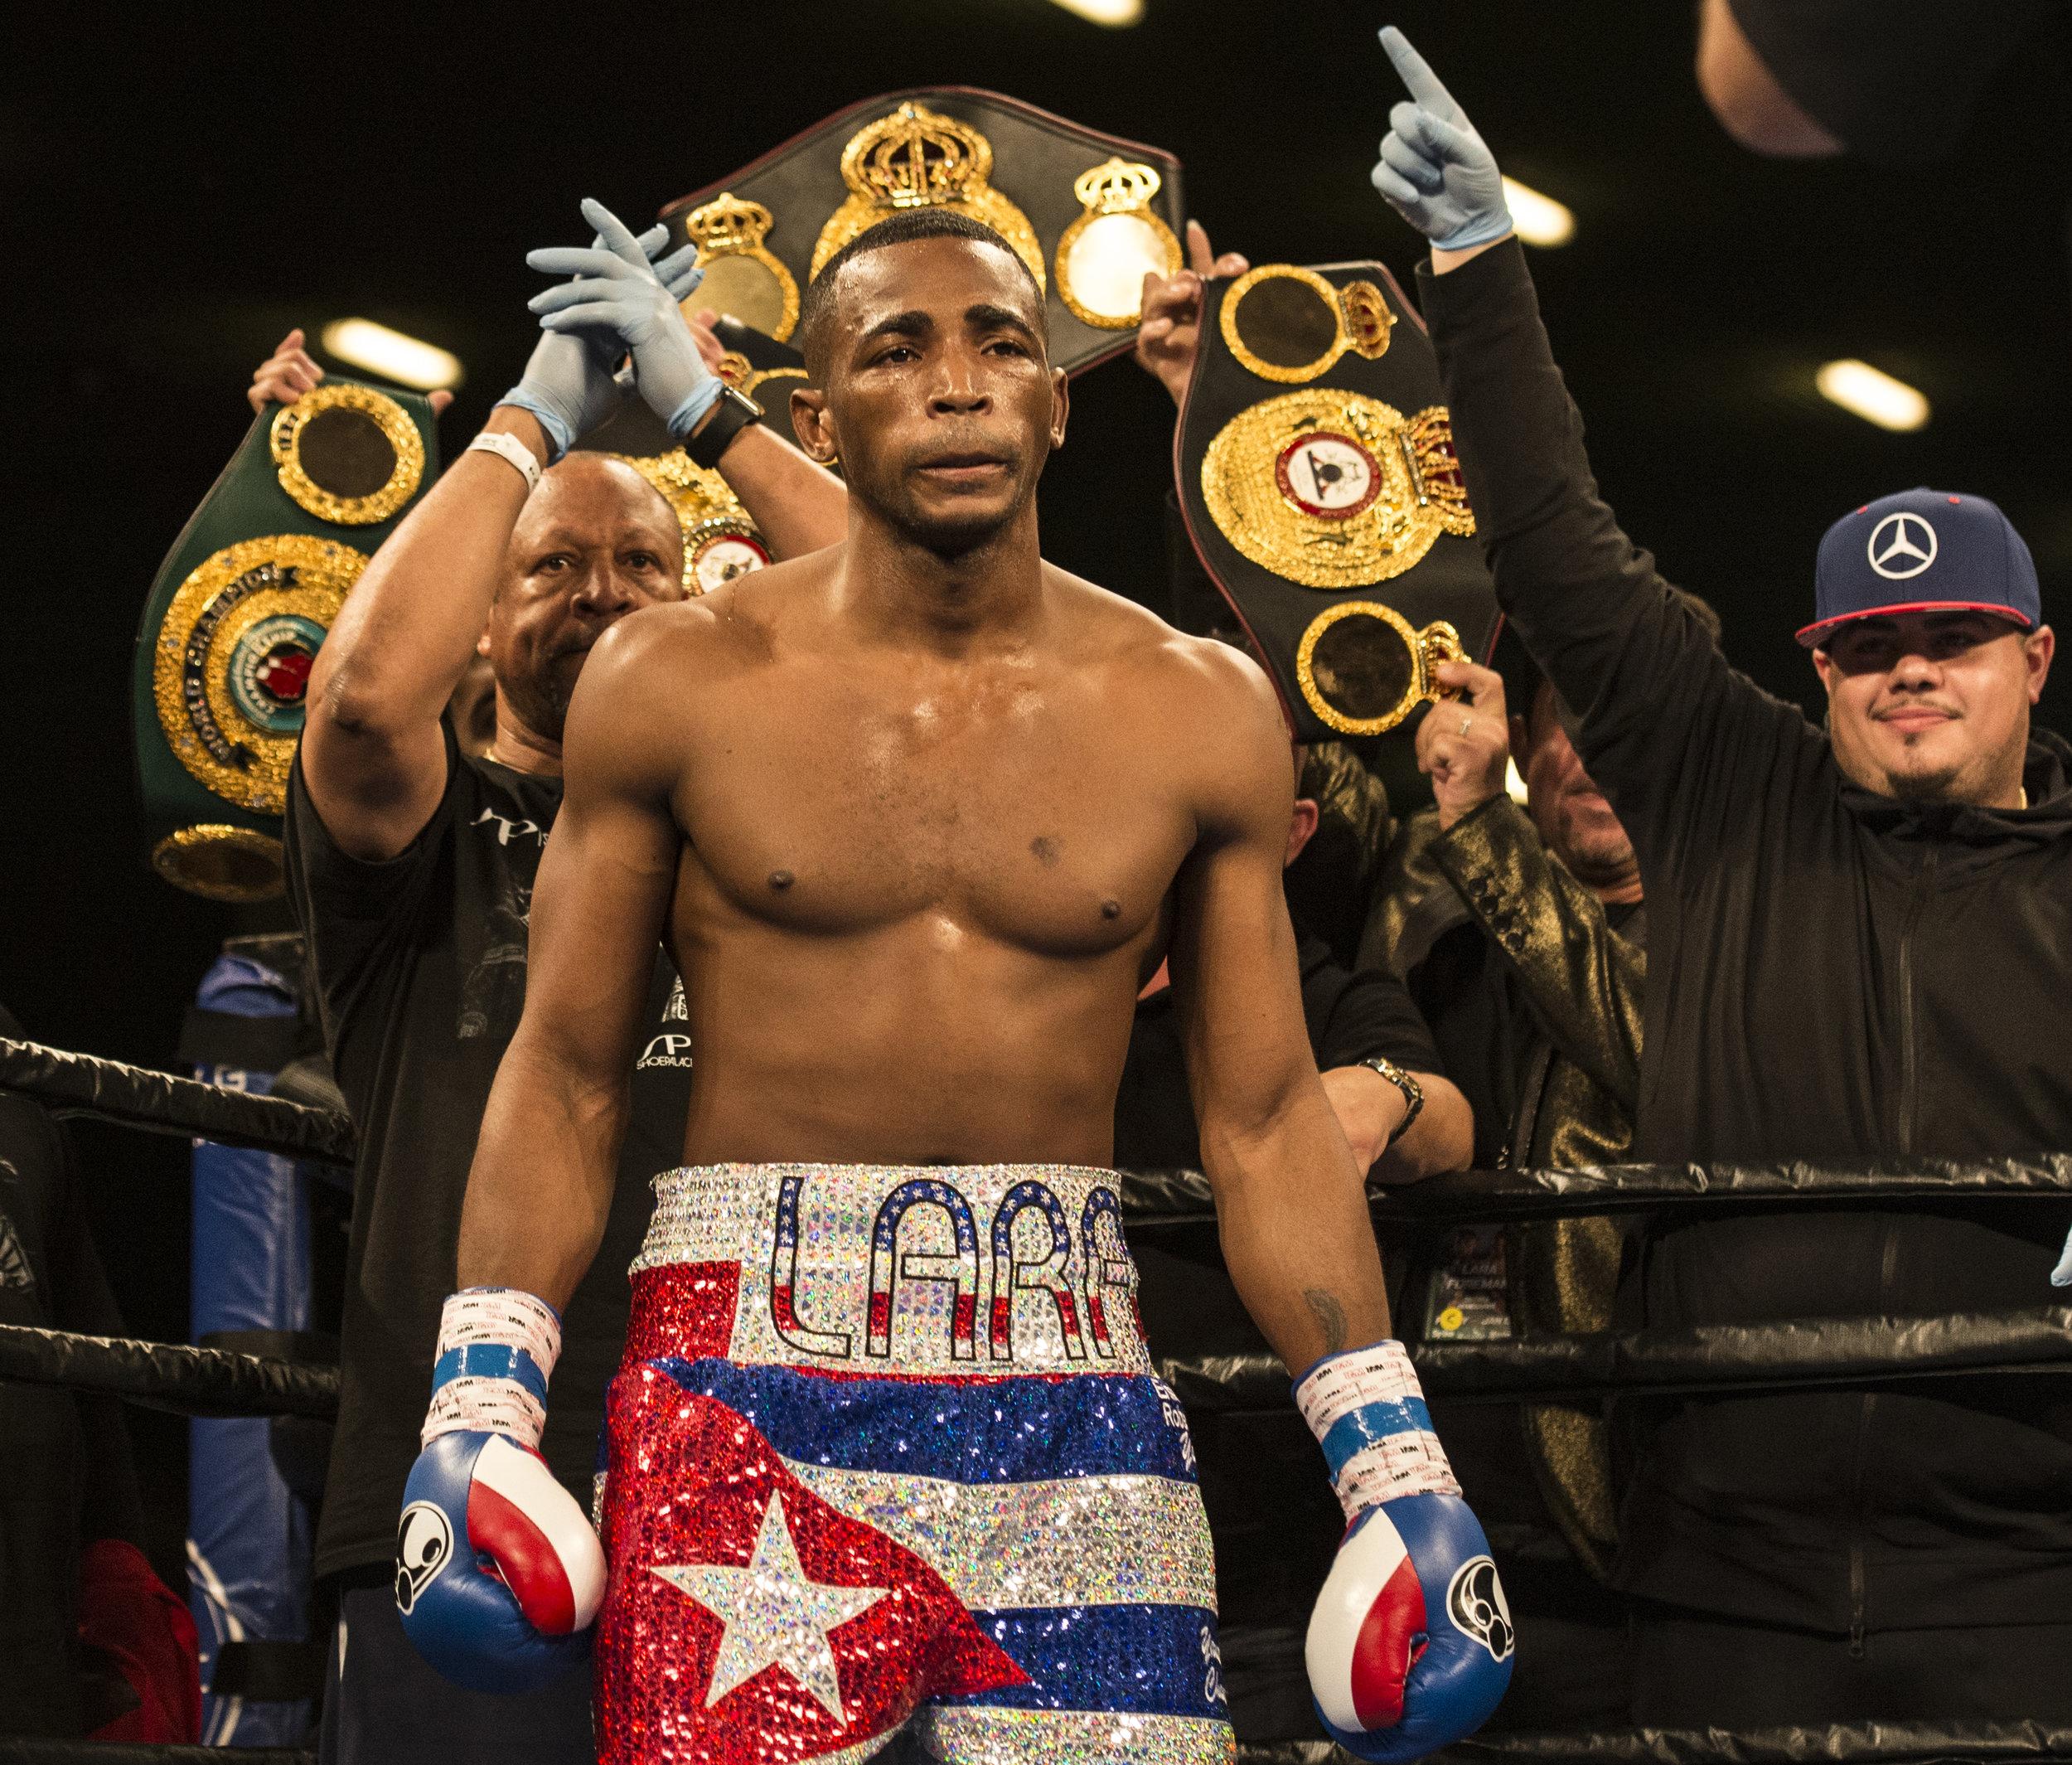 Cuban boxer Erislandy Lara is introduced before his fight versus Yuri Foreman at Hialeah Casino Park.